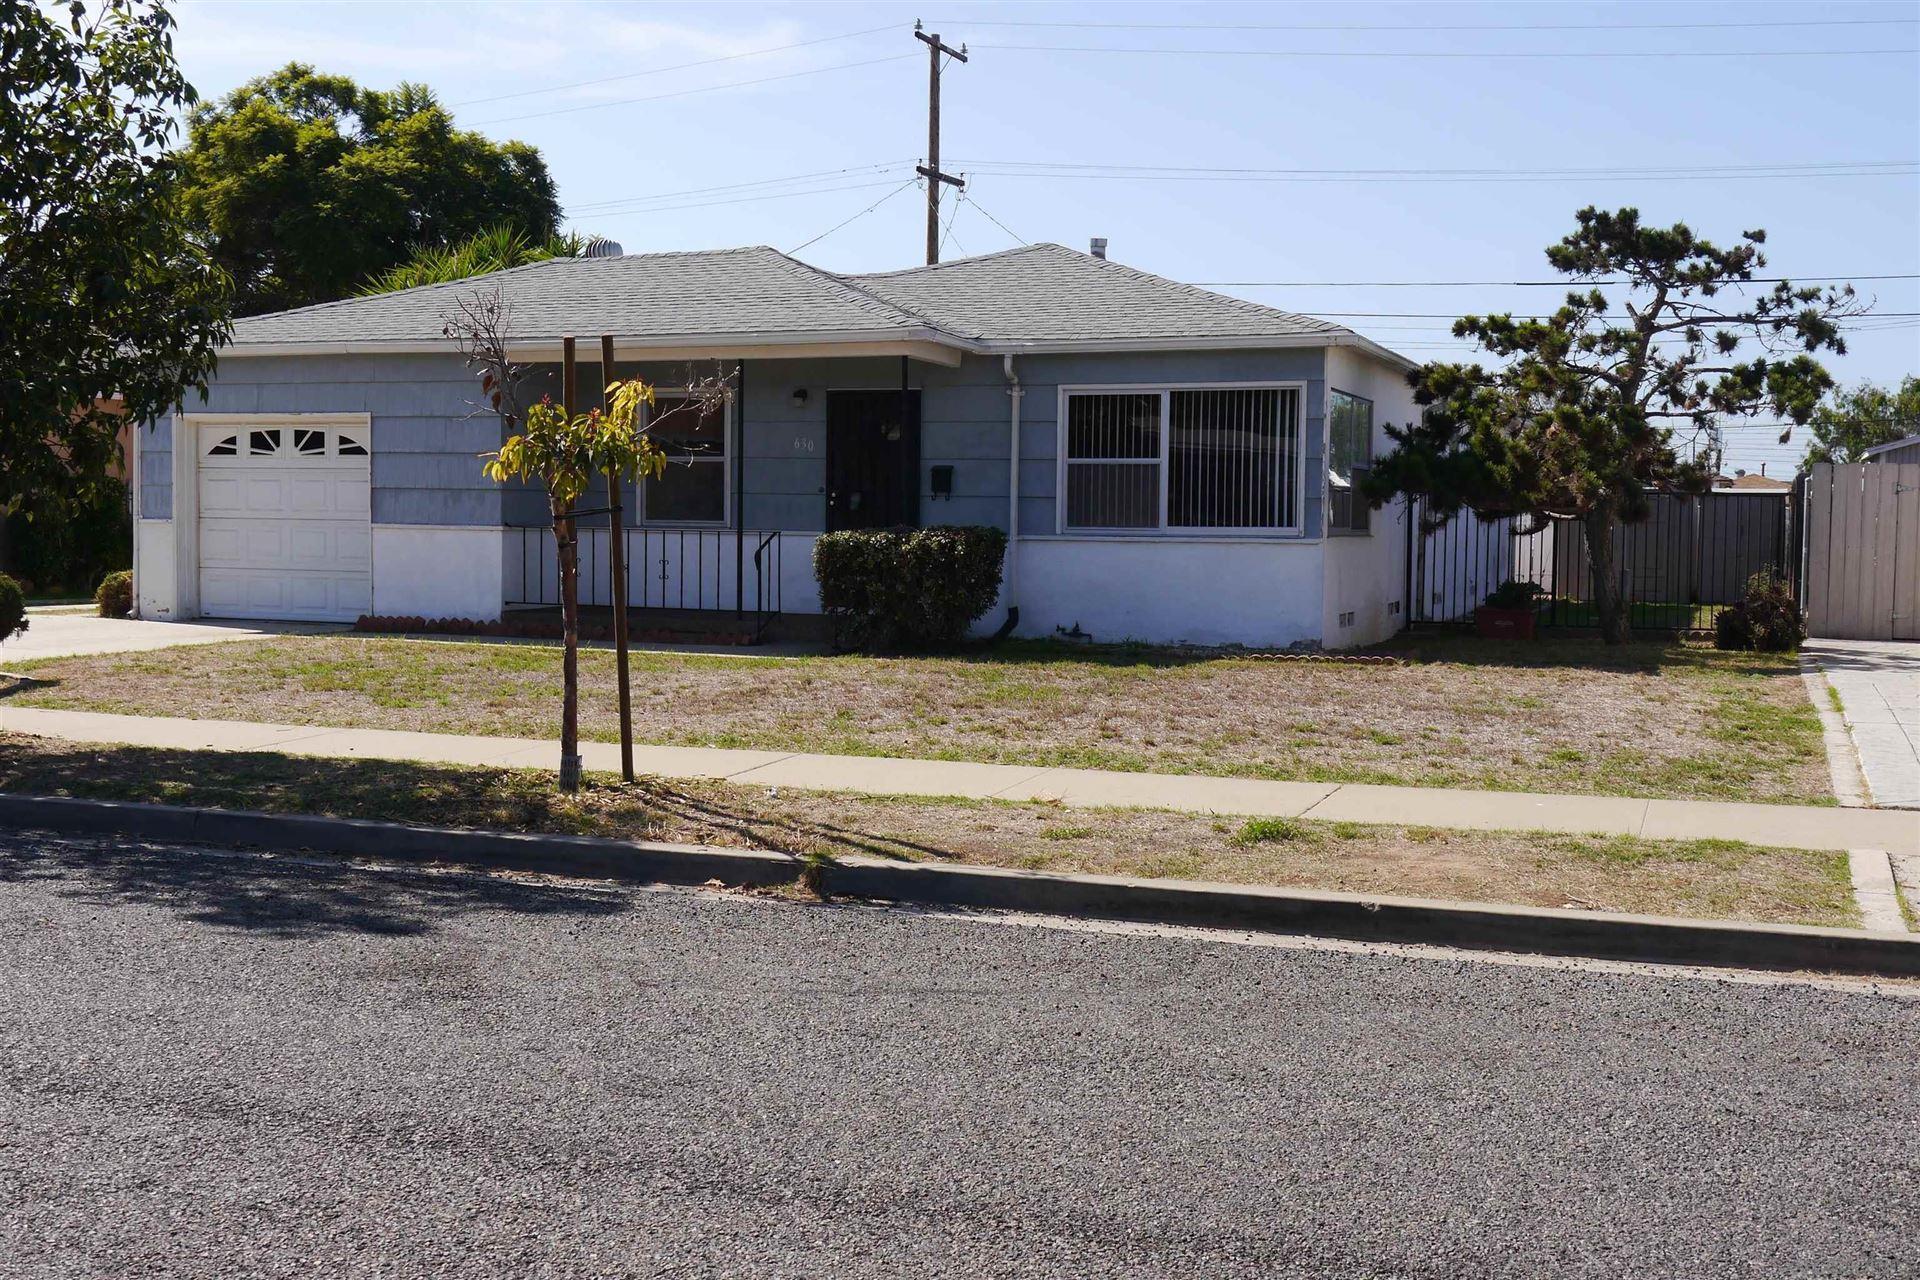 Photo of 630 Woodlawn Ave., Chula Vista, CA 91910 (MLS # 210029726)